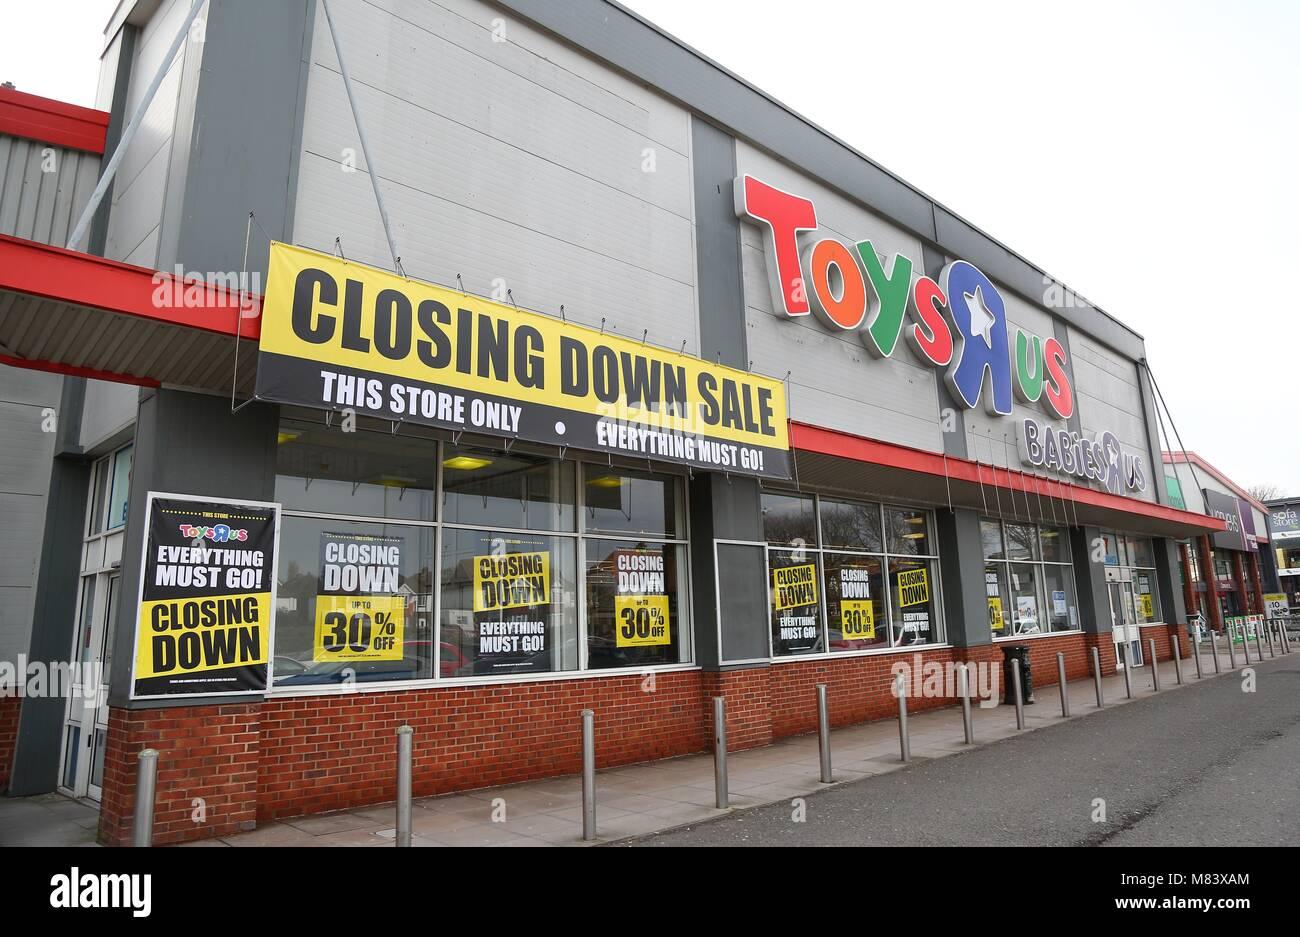 Toysrus Sale Store Stock Photos Toysrus Sale Store Stock Images